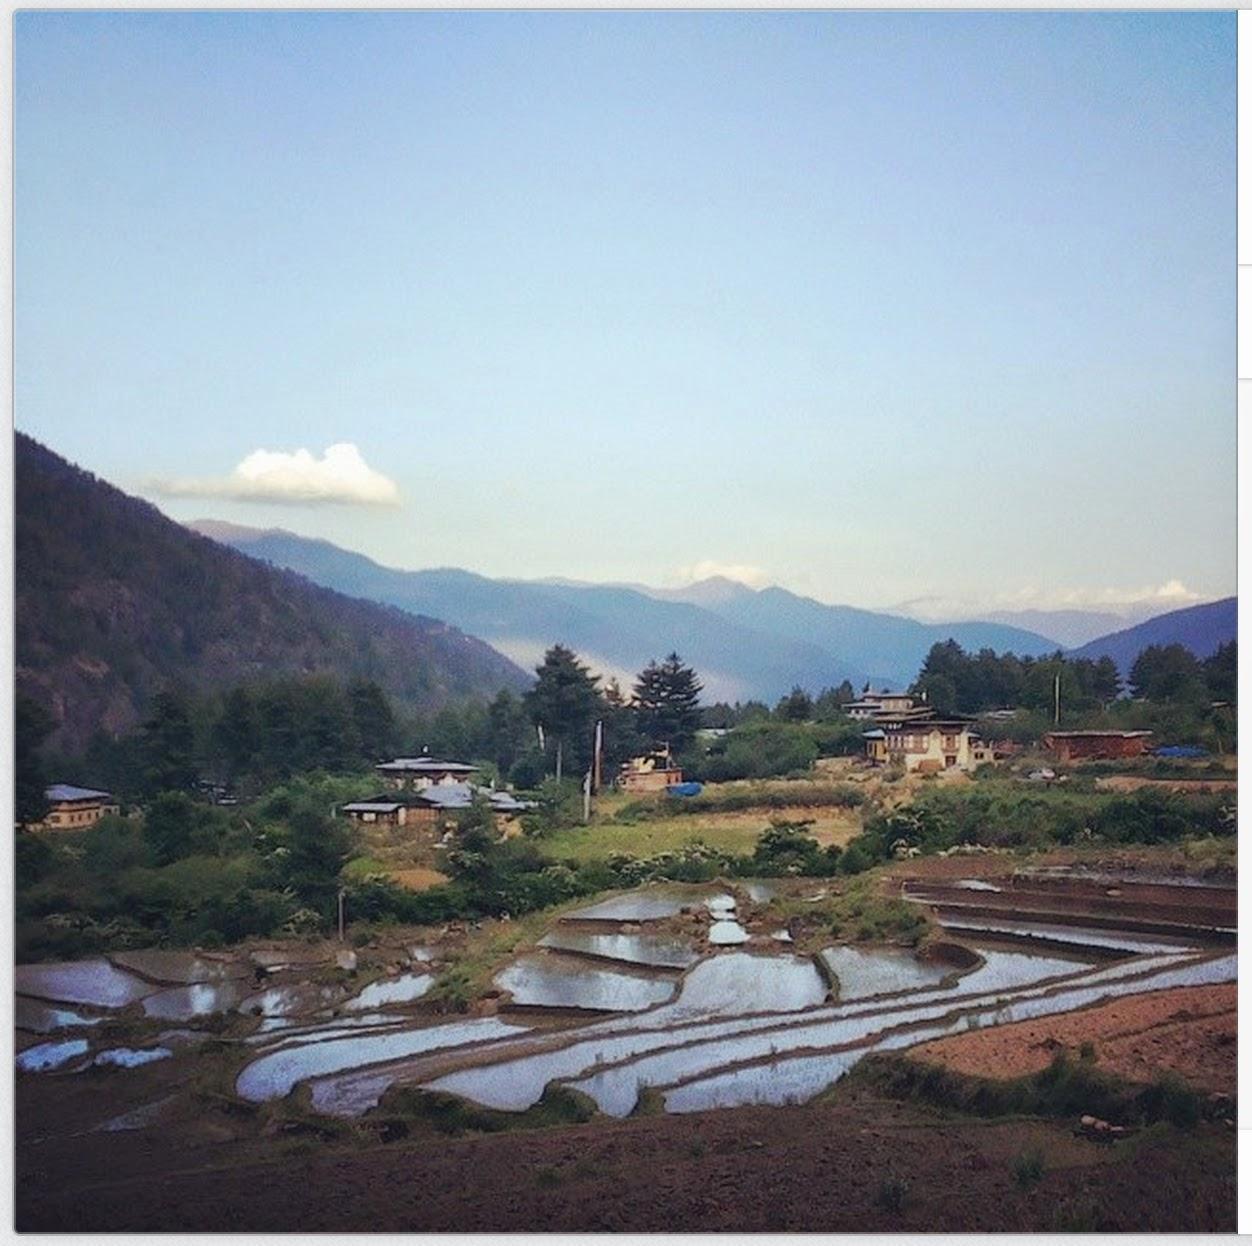 Rice Fields of Paro, Bhutan